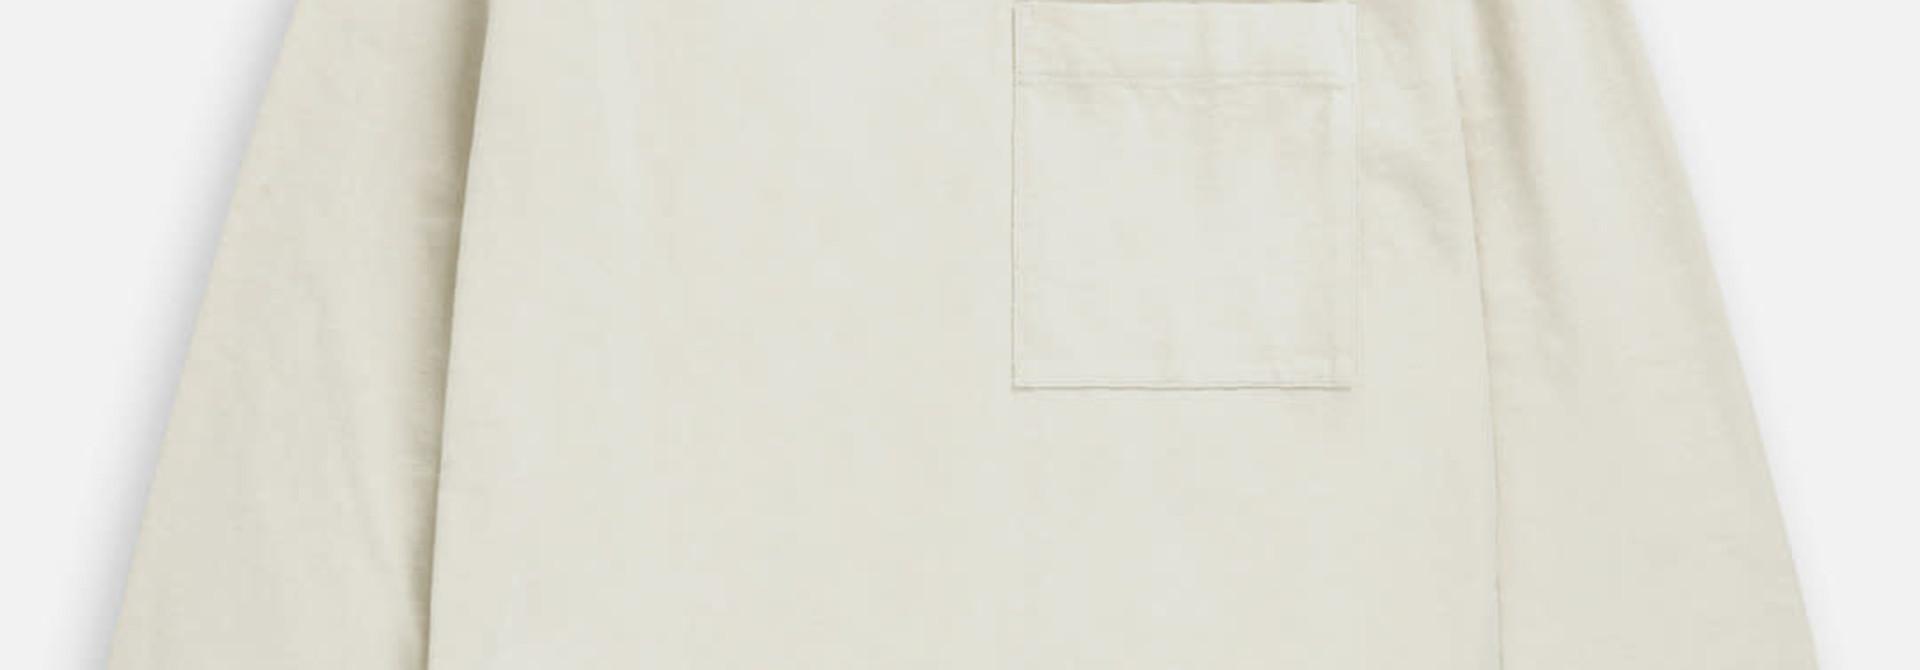 longsleeve antique white